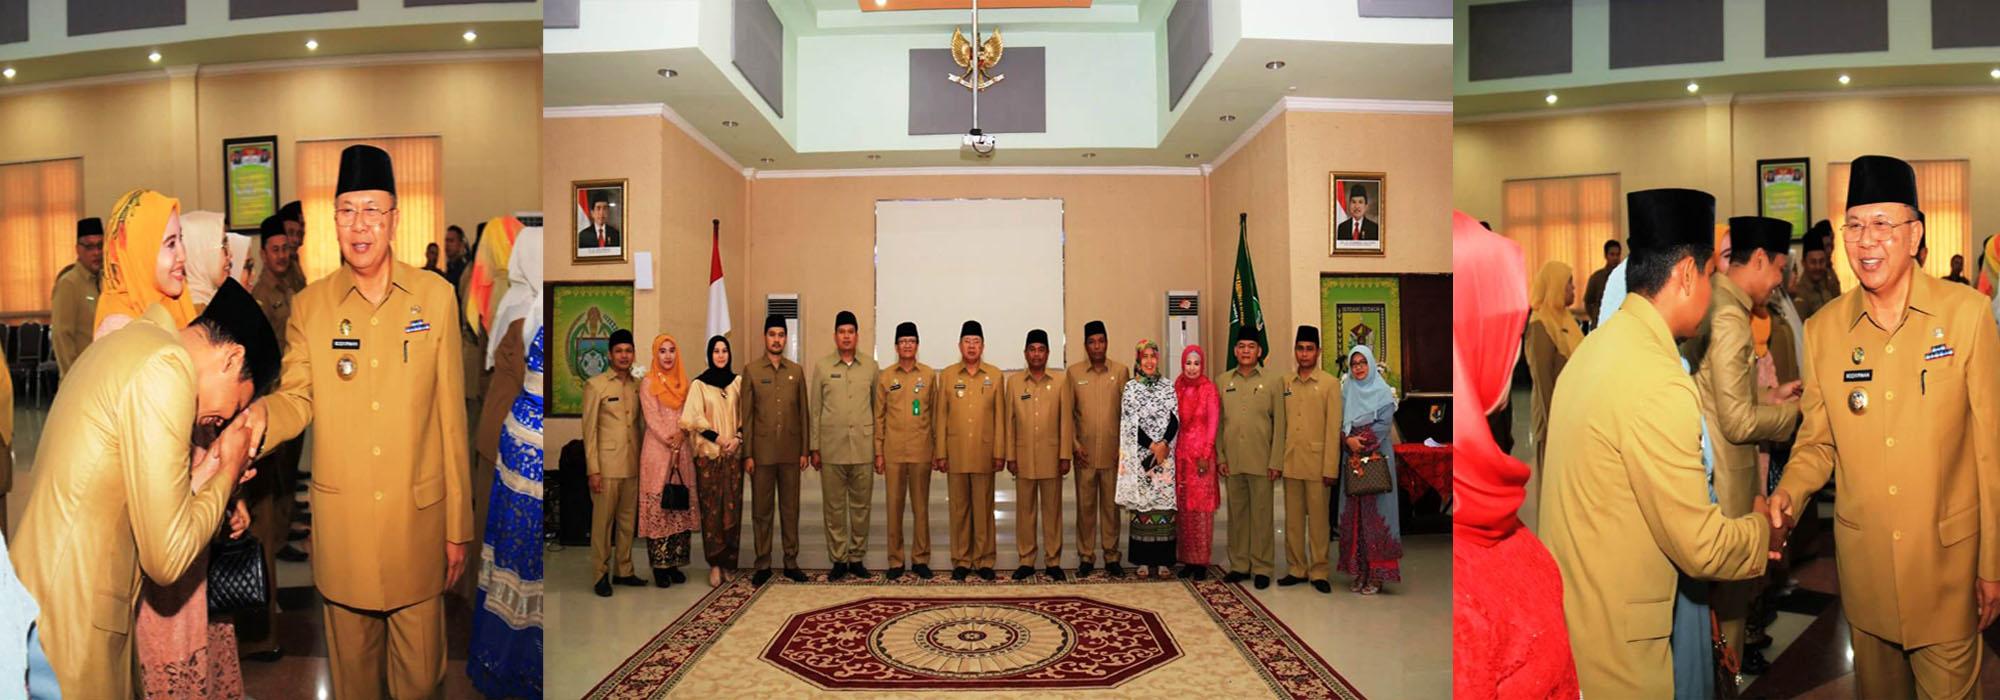 46 Pejabat Dilantik, 3 Diantaranya Pejabat Administrator Dinas Kominfo